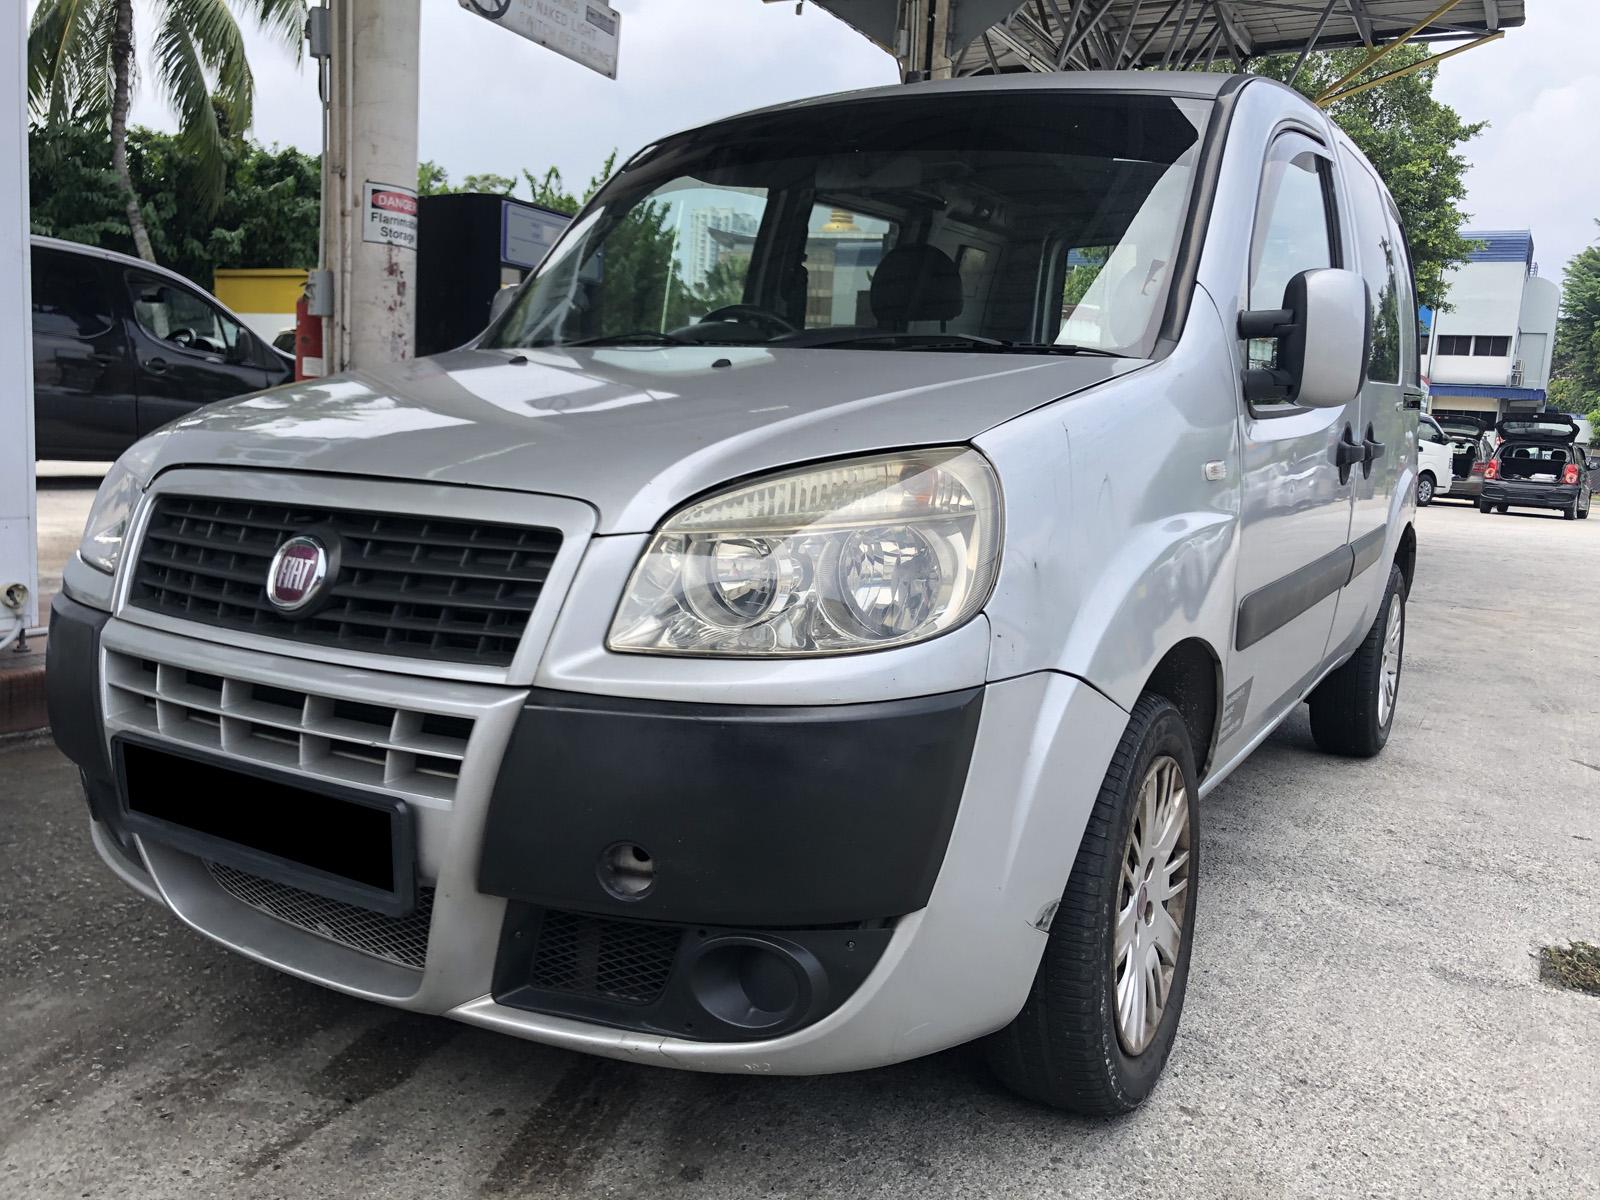 Fiat Doblo (For Rent)